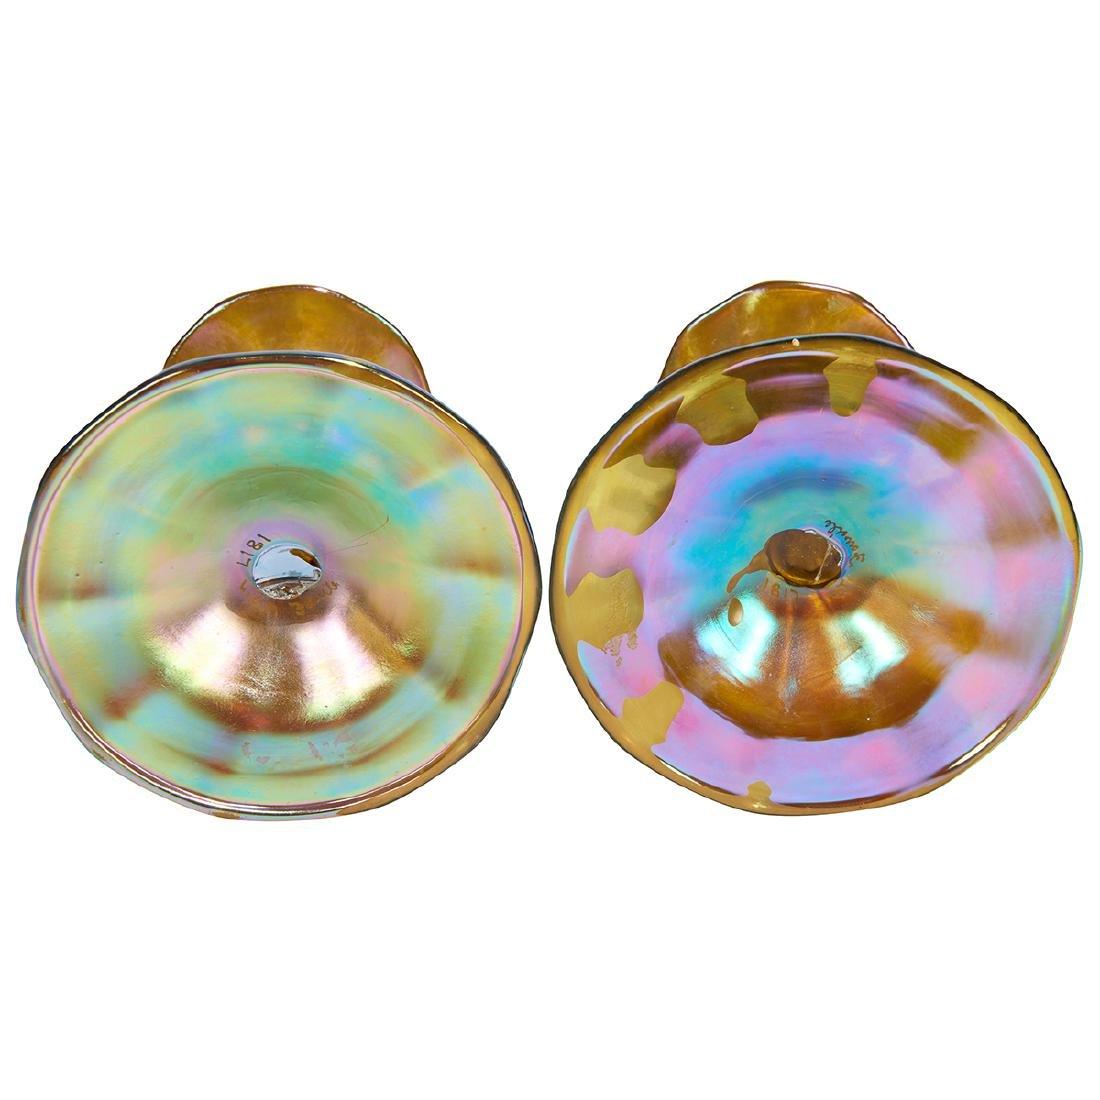 L.C. Tiffany Favrile candlesticks, pair - 2